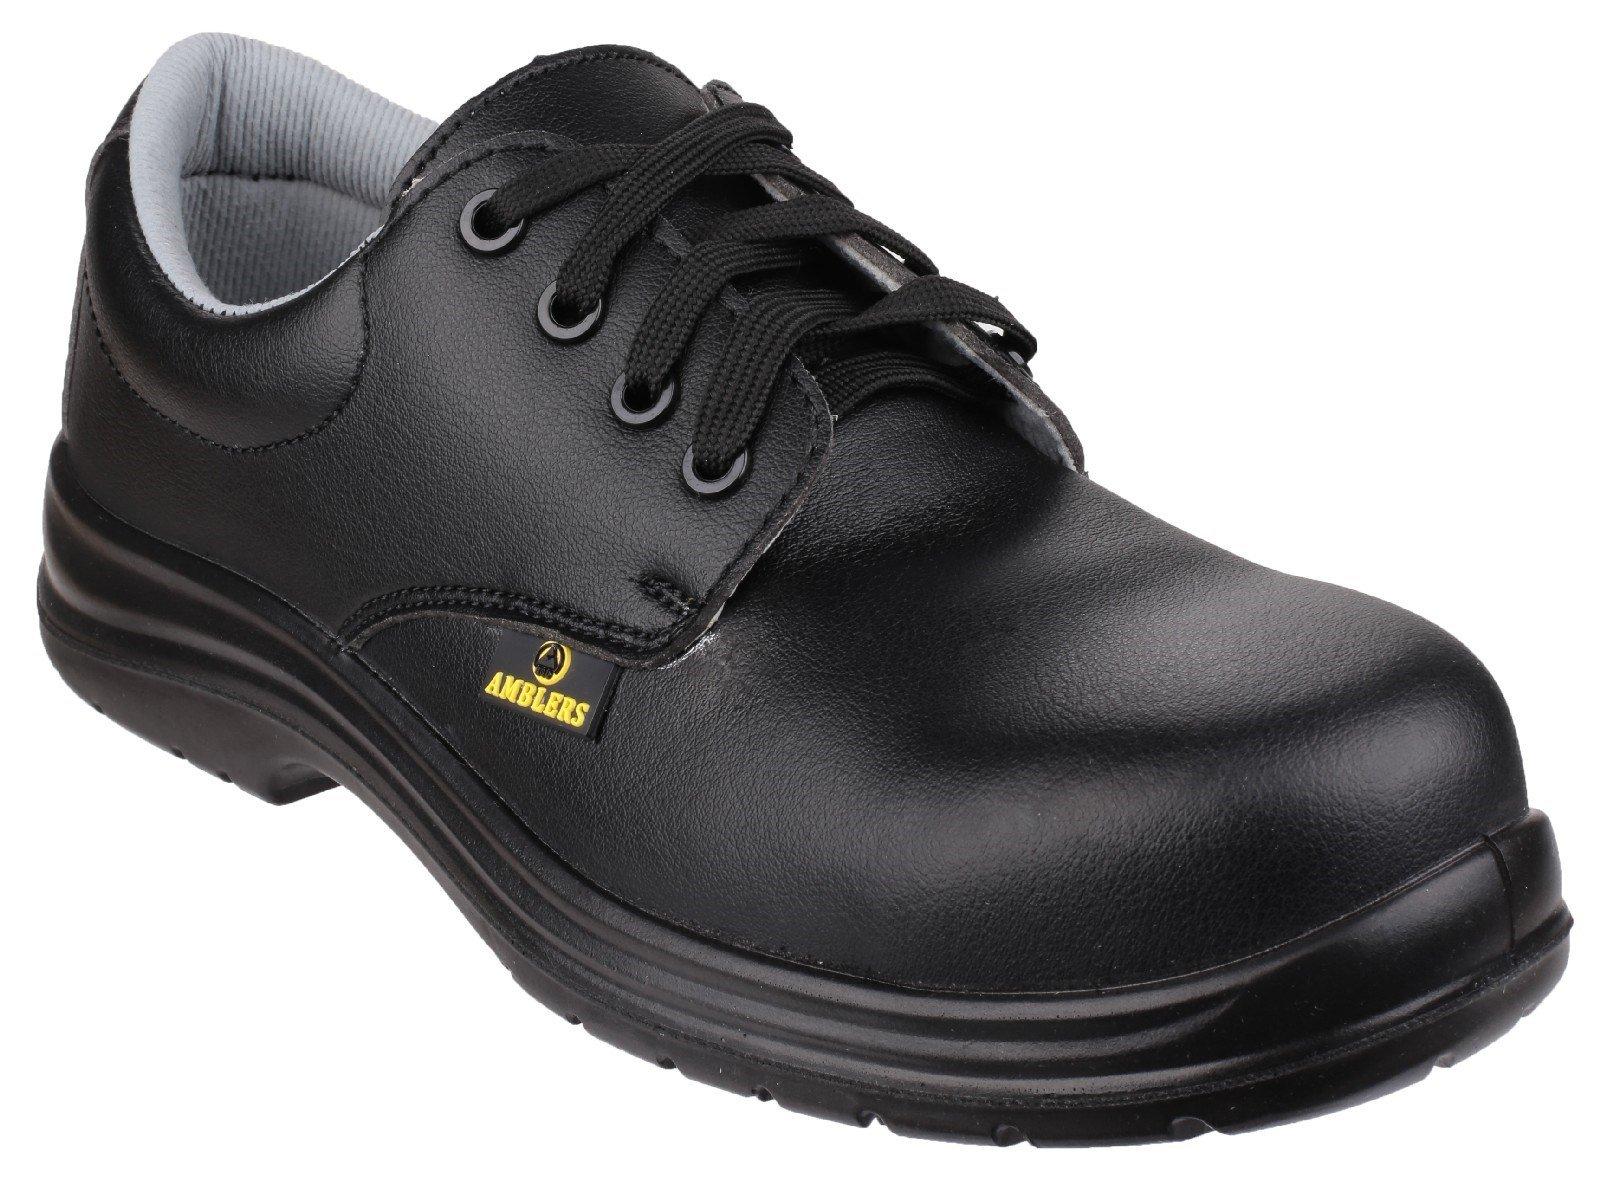 Amblers Unisex Safety Metal Free Water Resistant Lace up Shoe Black 20438 - Black 8